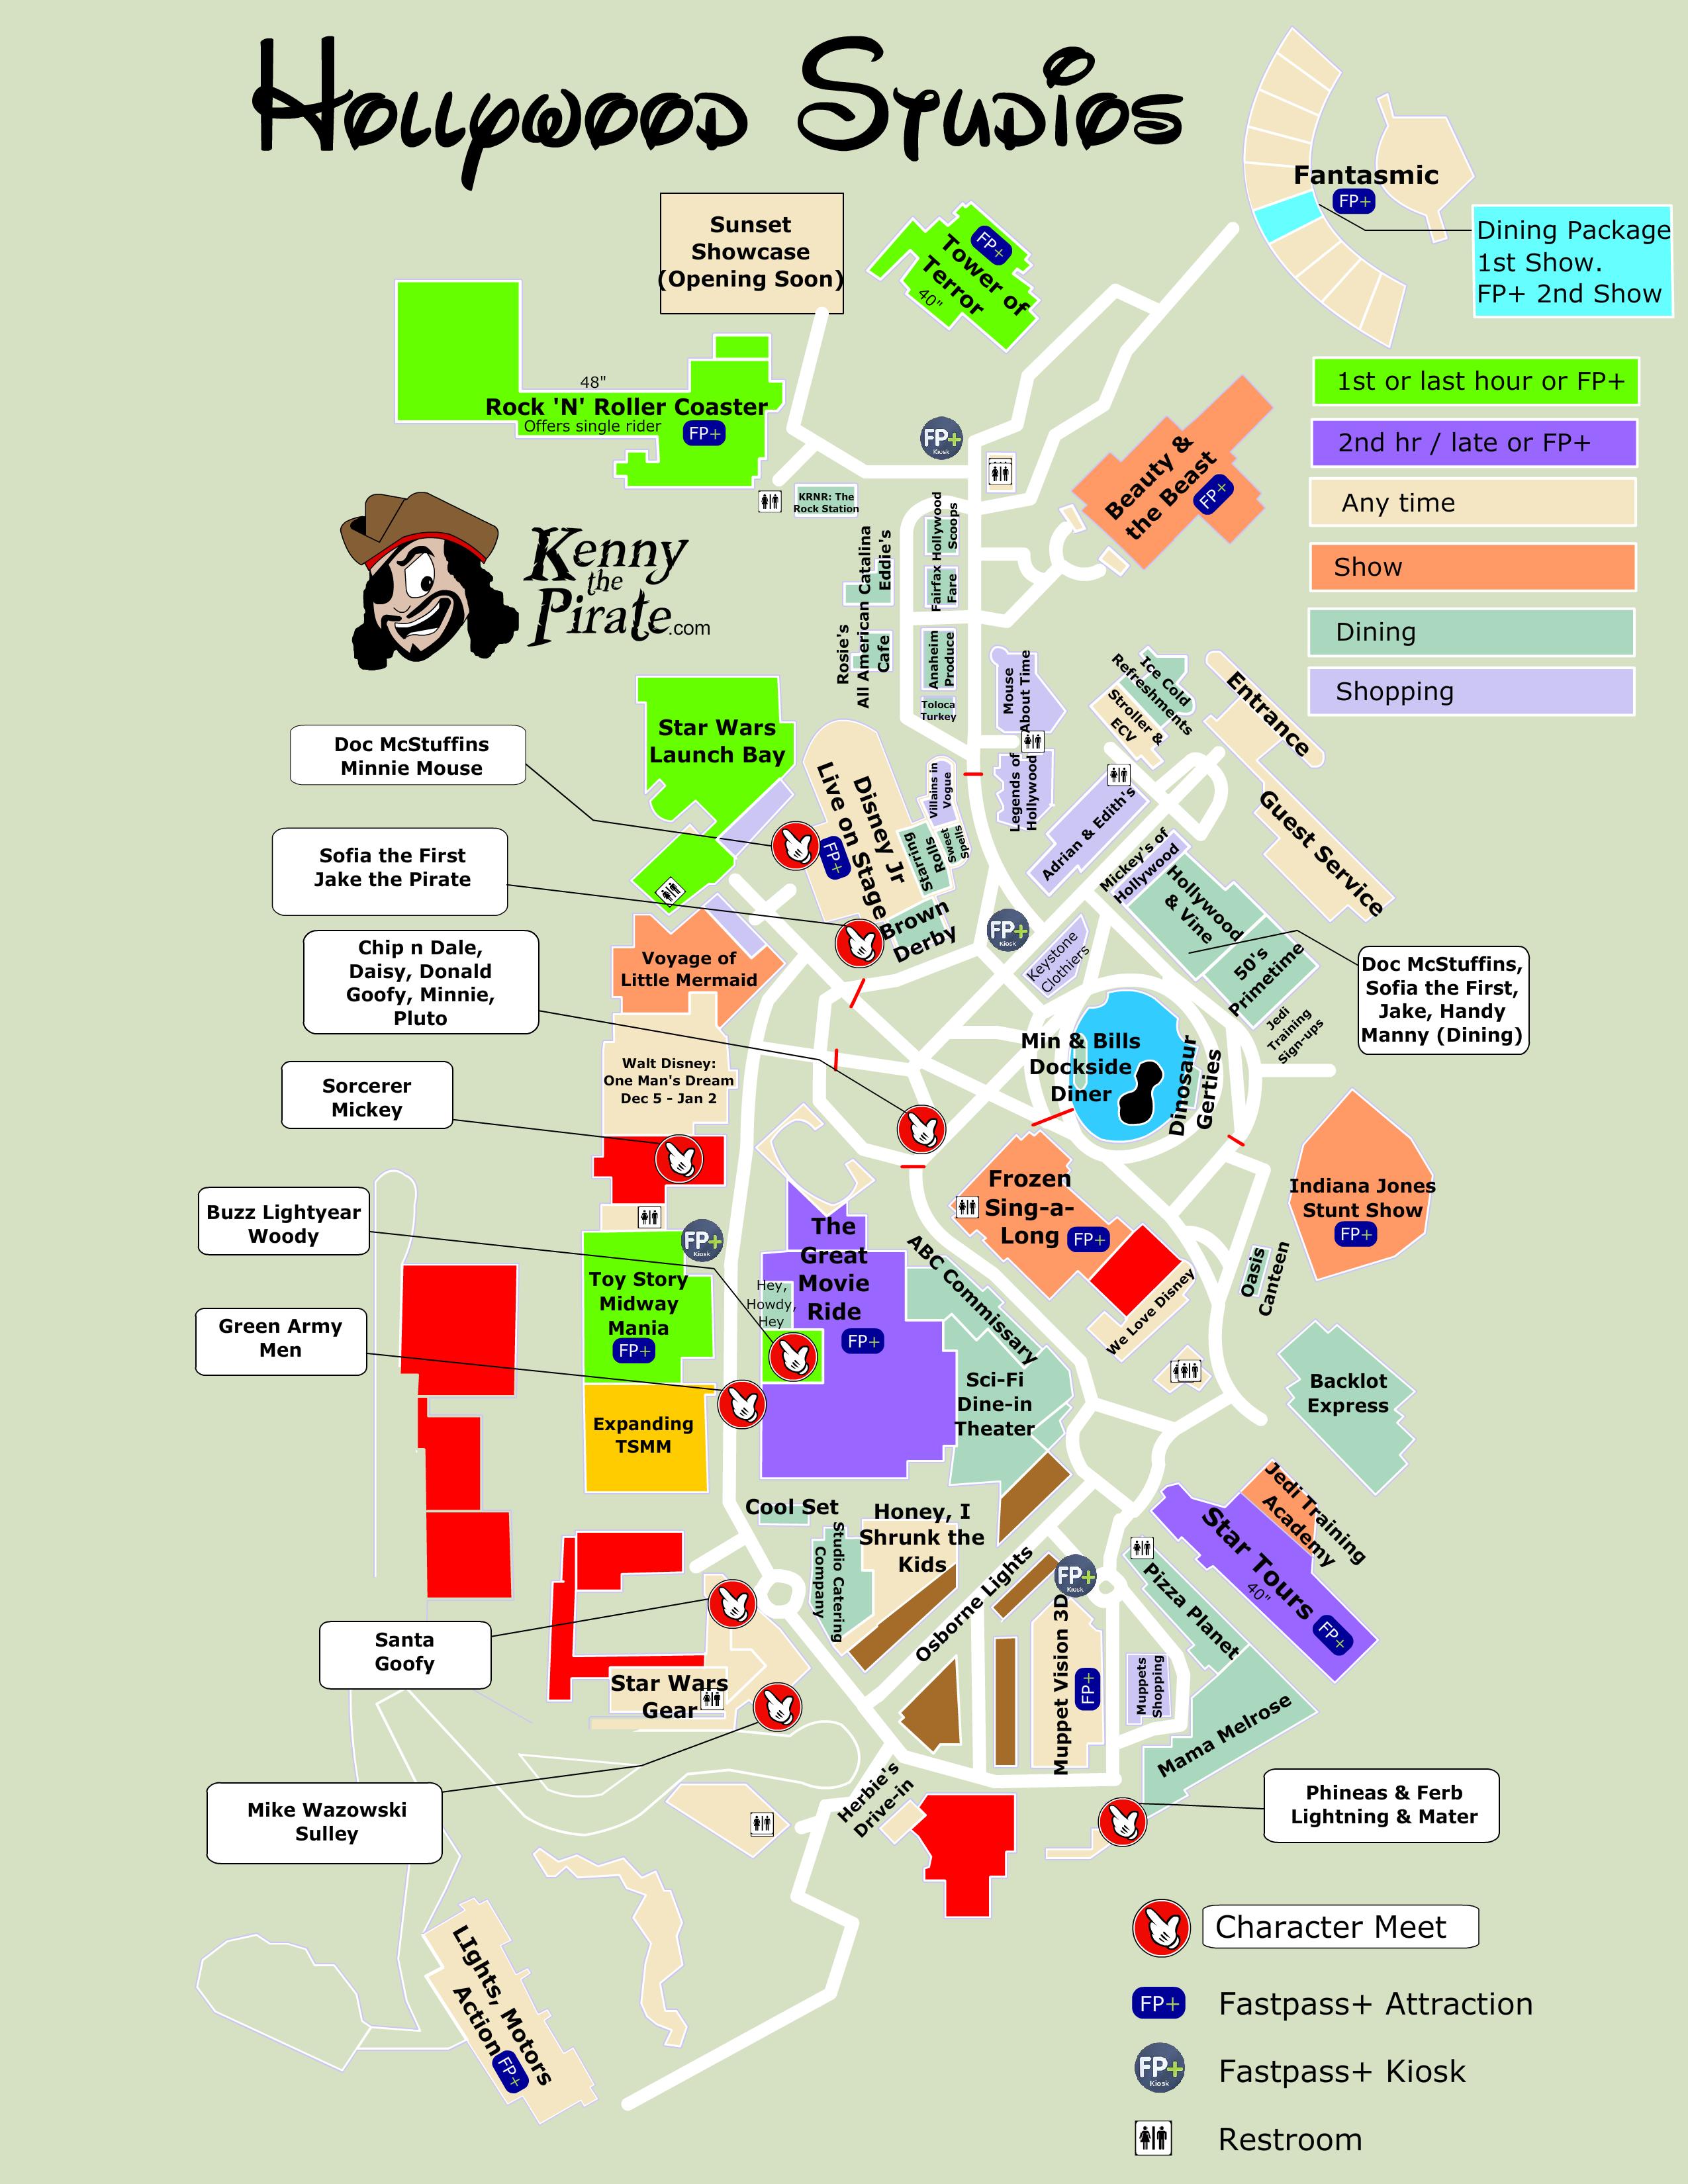 Universal Studios Map 2019 : universal, studios, Disney:, Disney, World, Hollywood, Studios